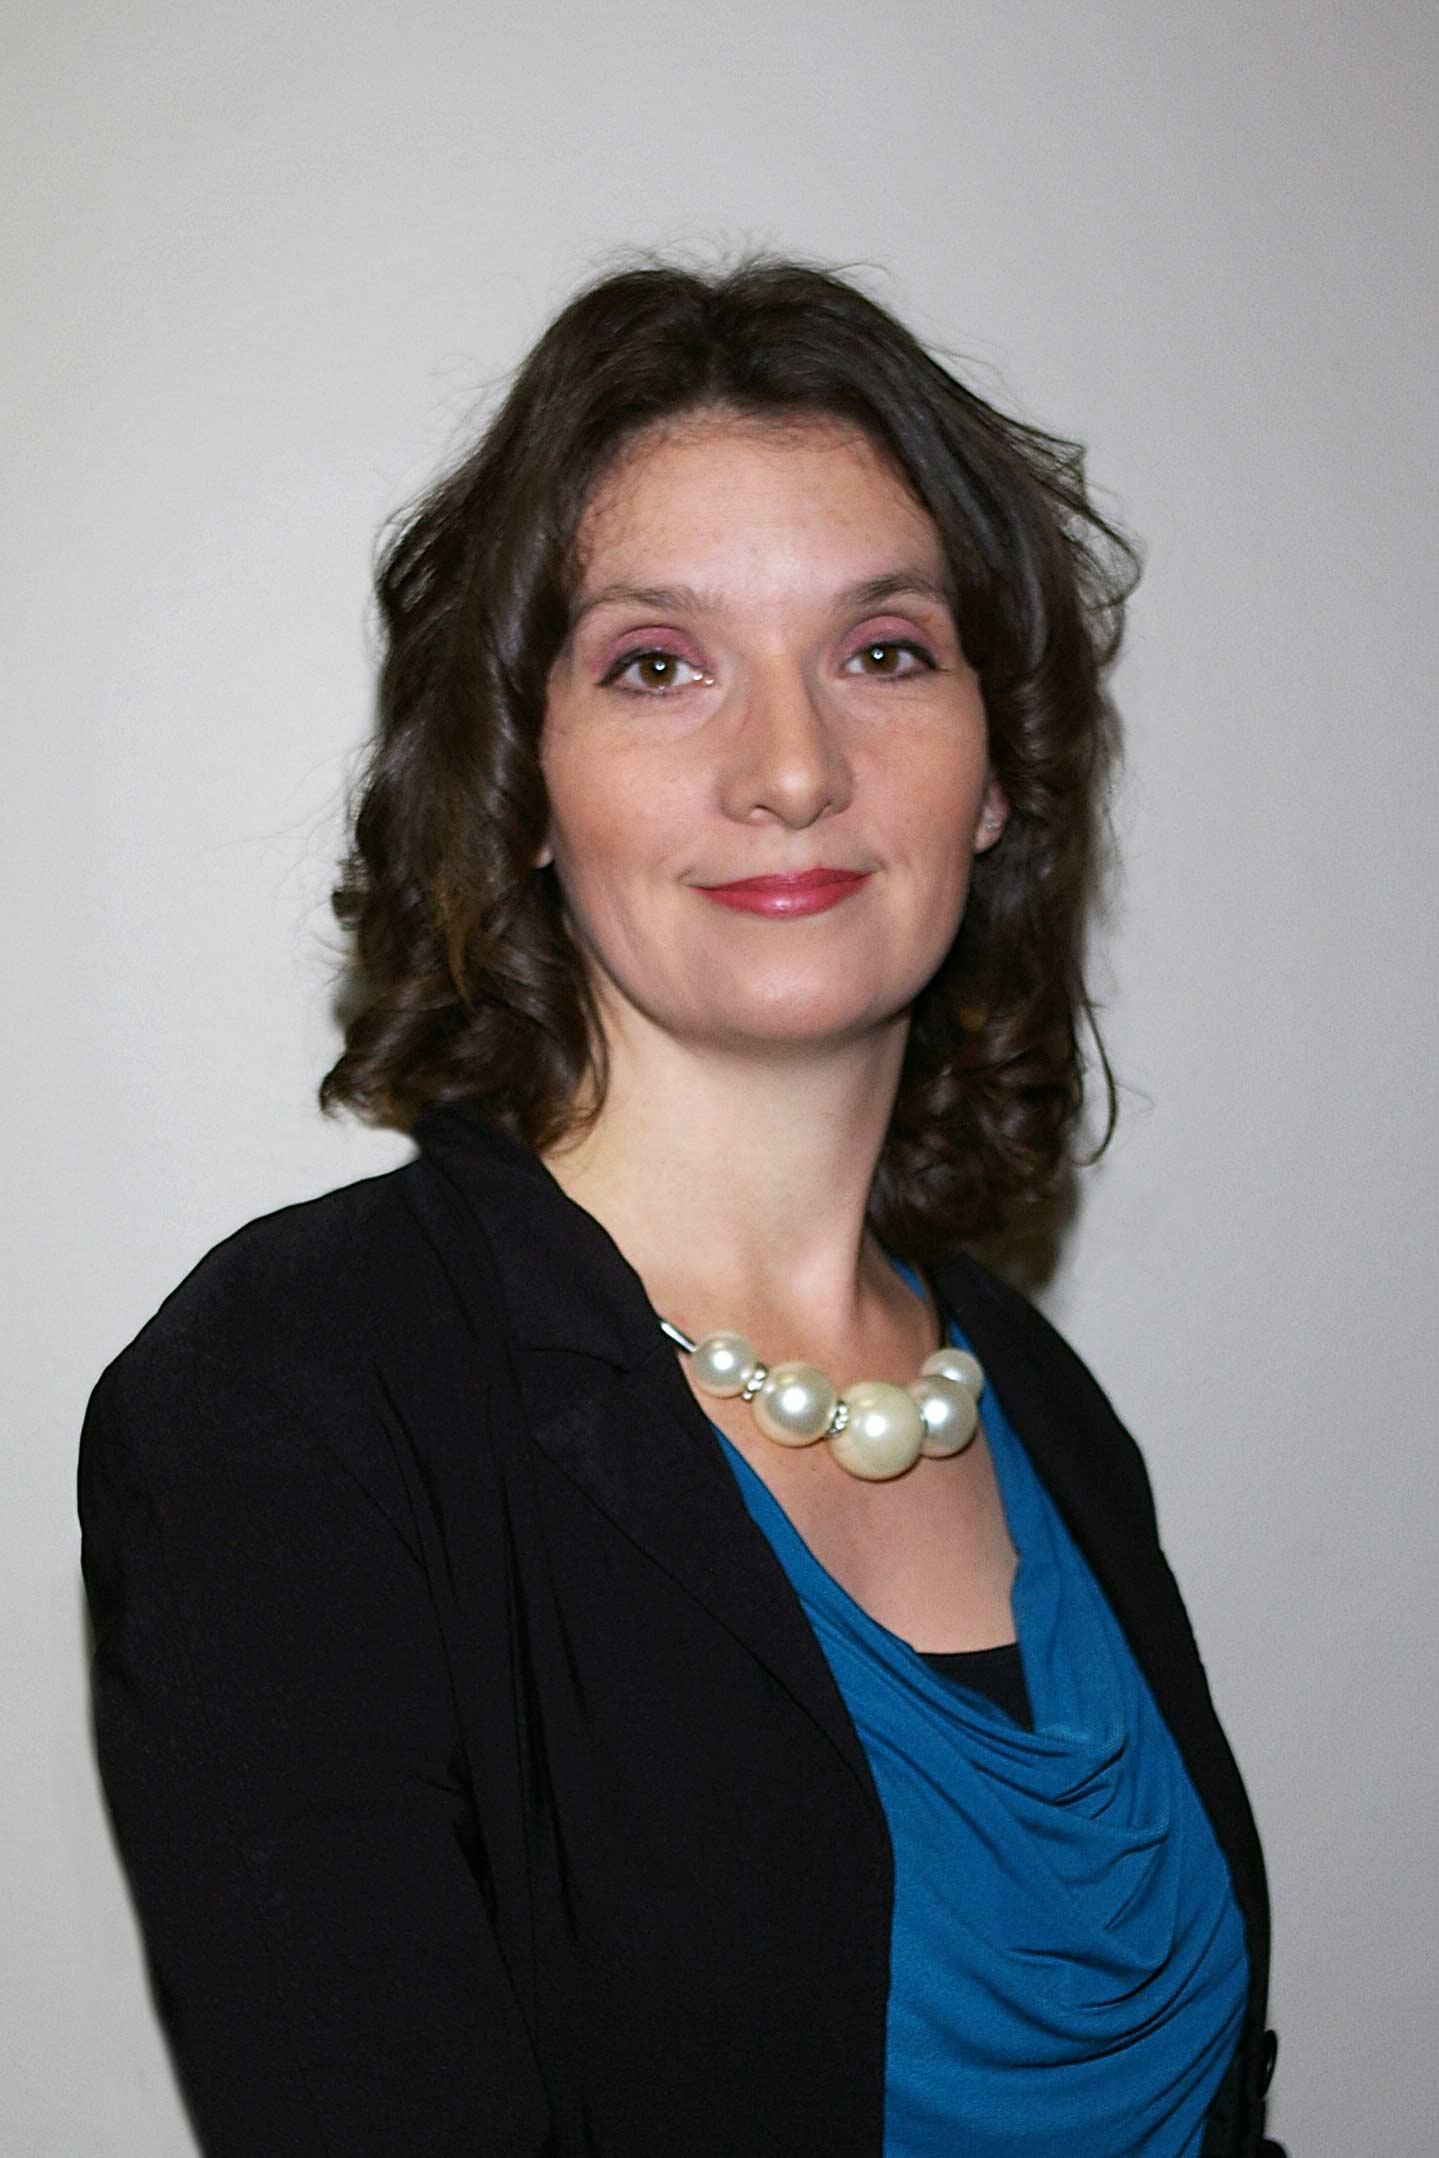 City Councillor Melissa Draycott